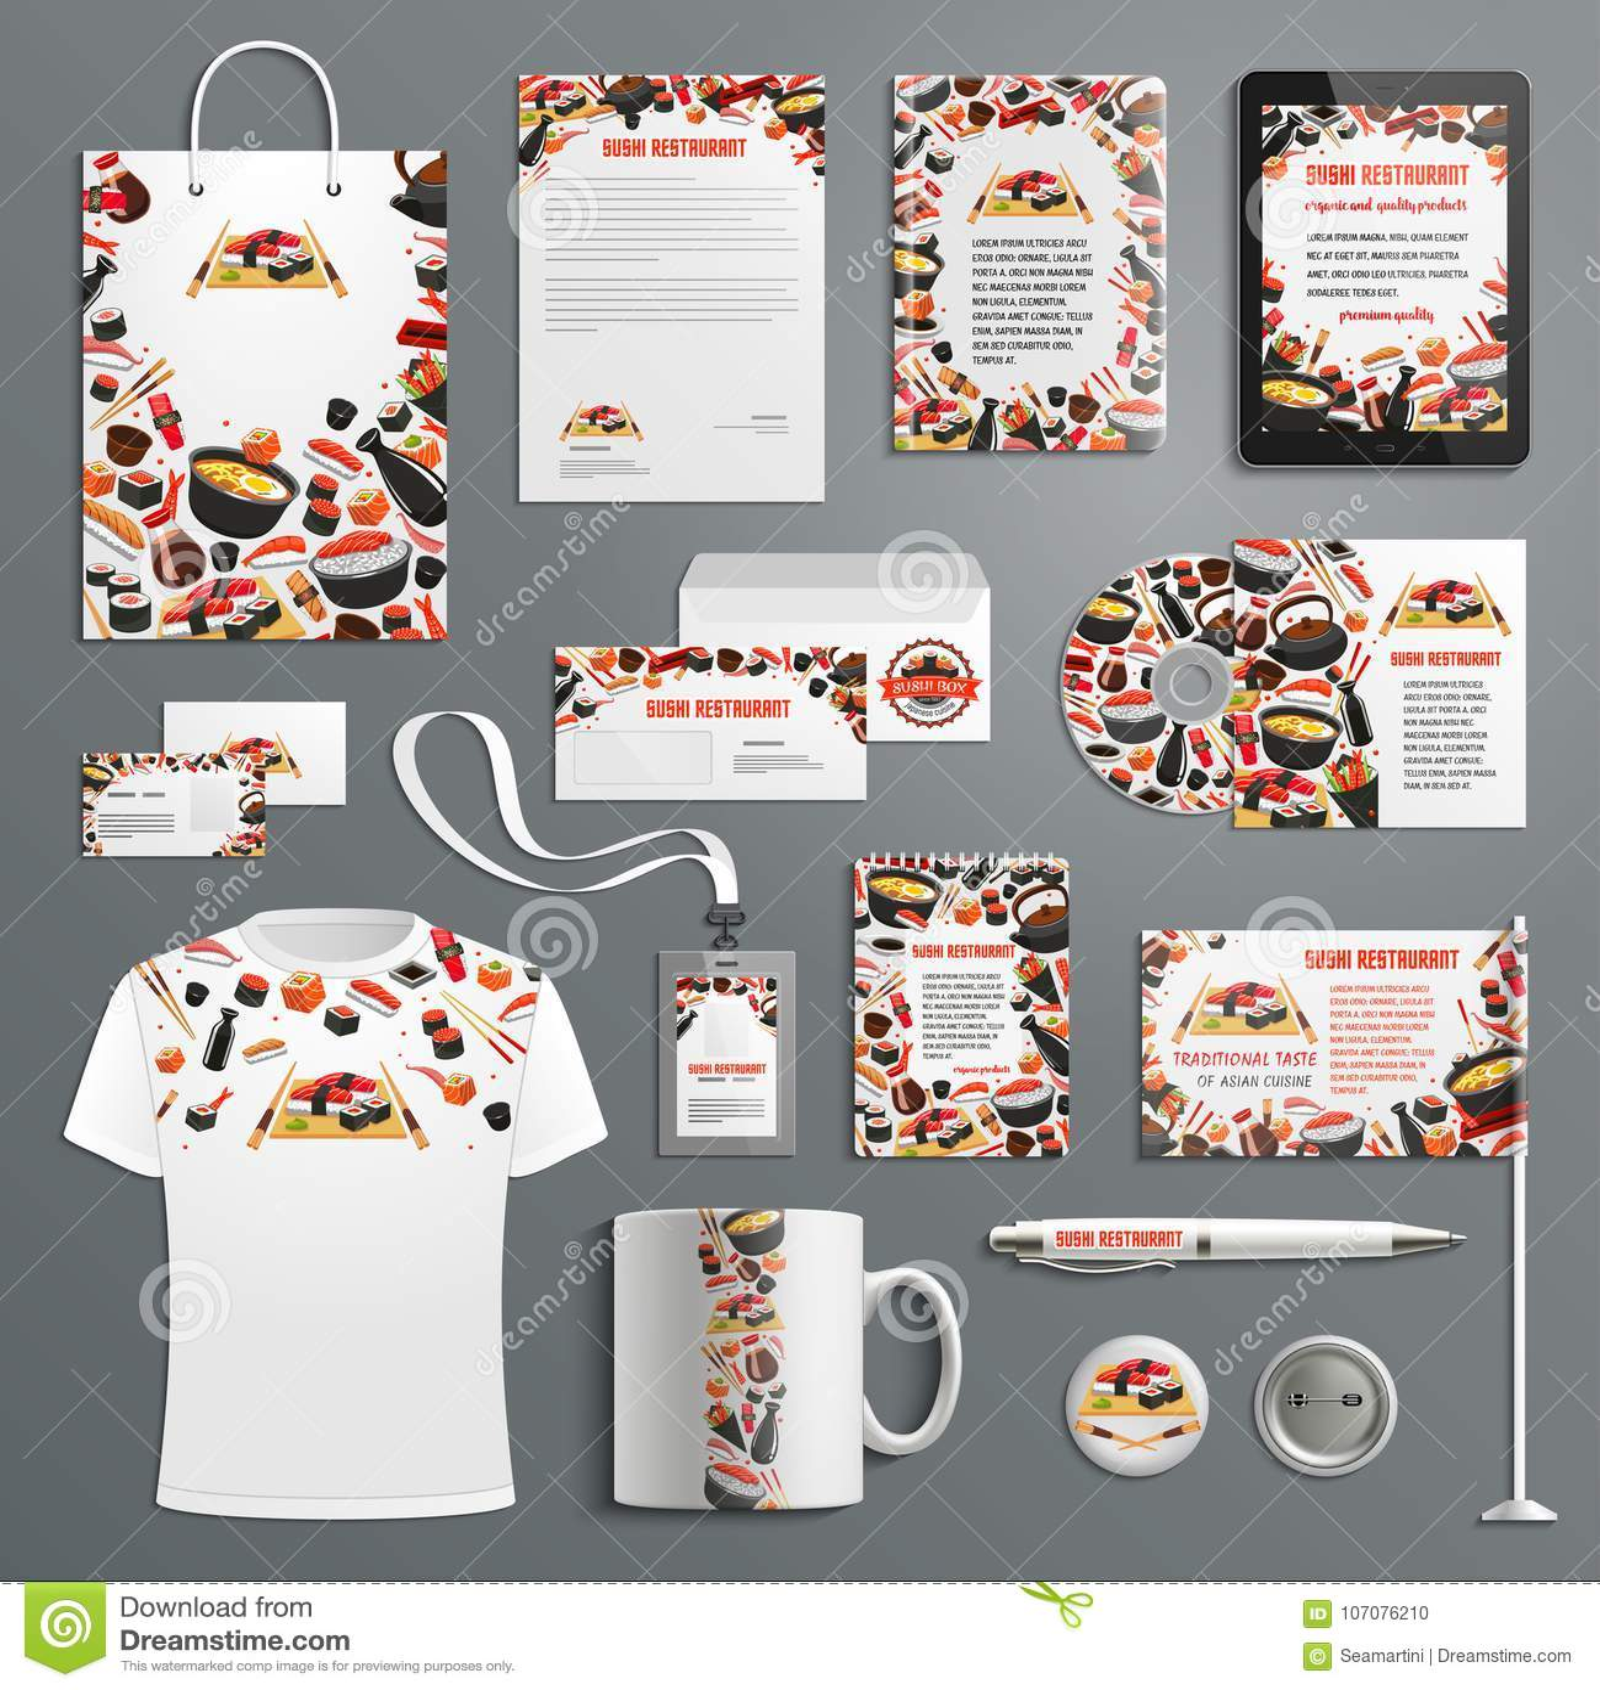 Advertising Promo Vector Items Japanese Cuisine Stock Vector